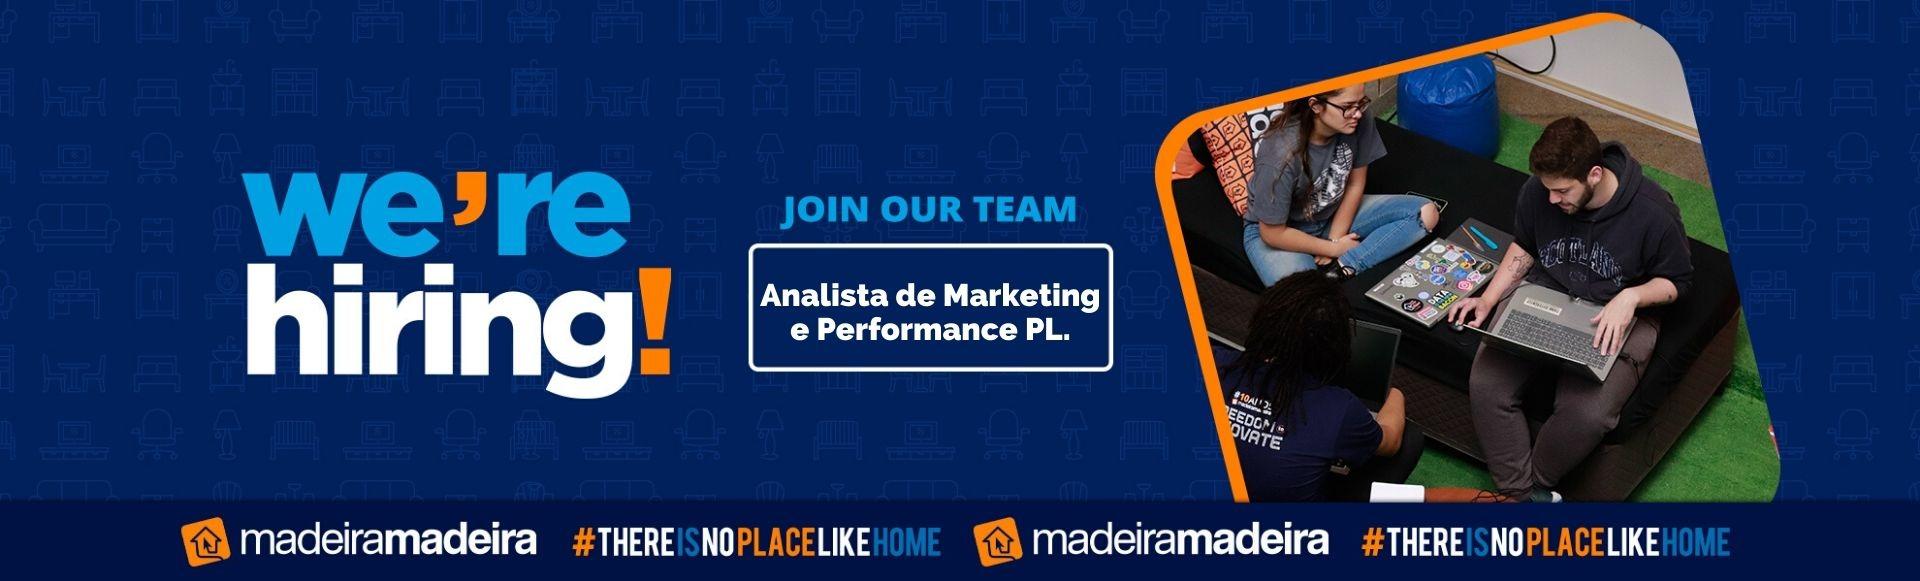 Analista de Marketing e Performance PL